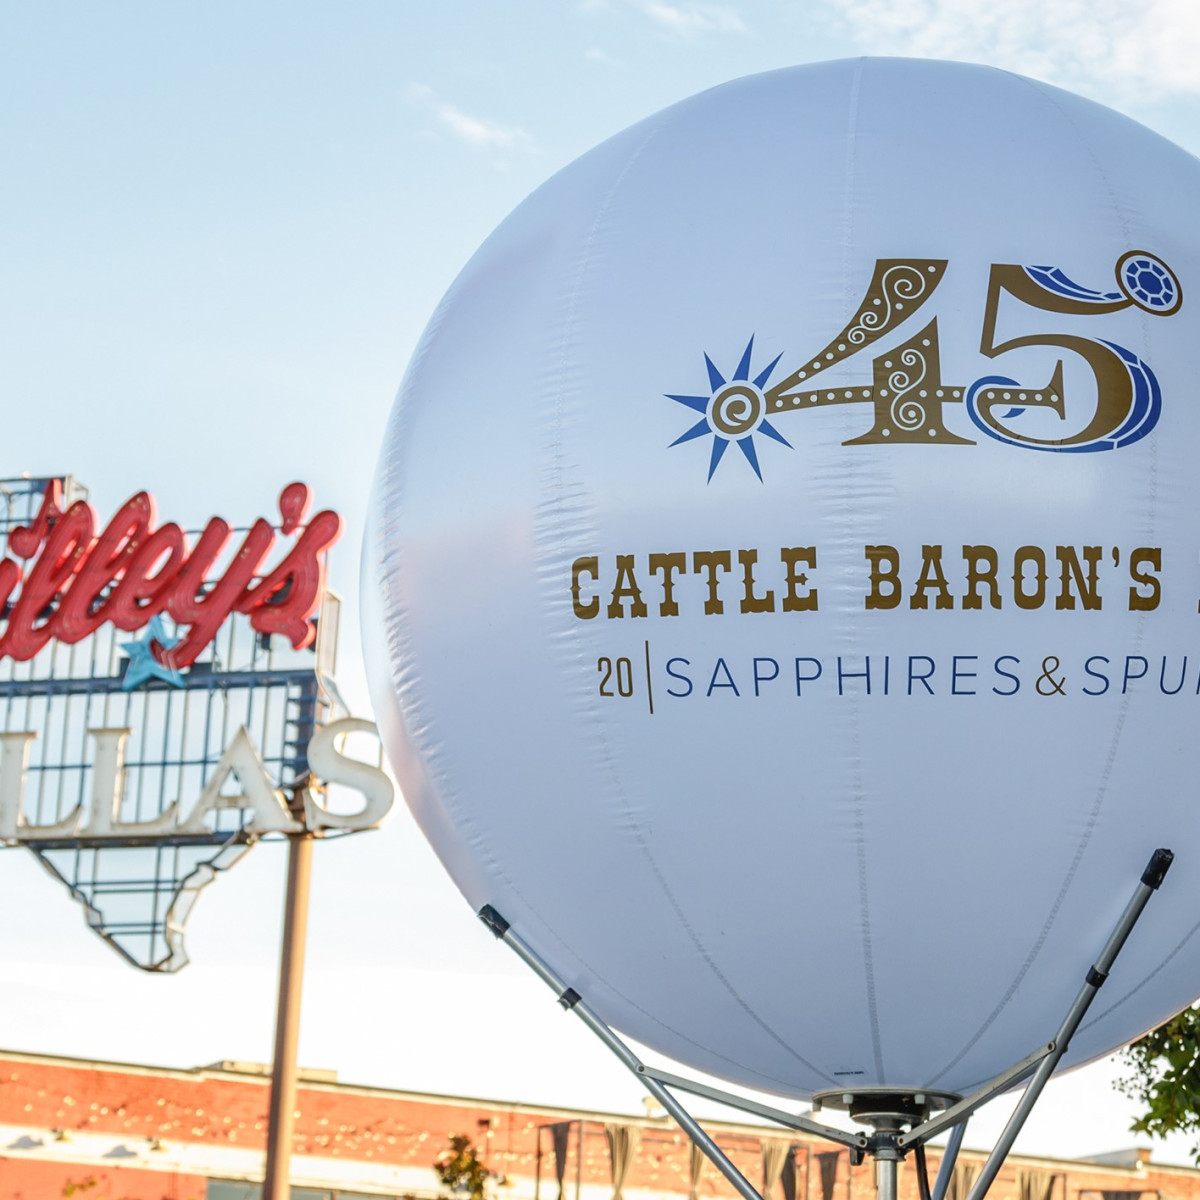 Cattle Baron's Ball 2018